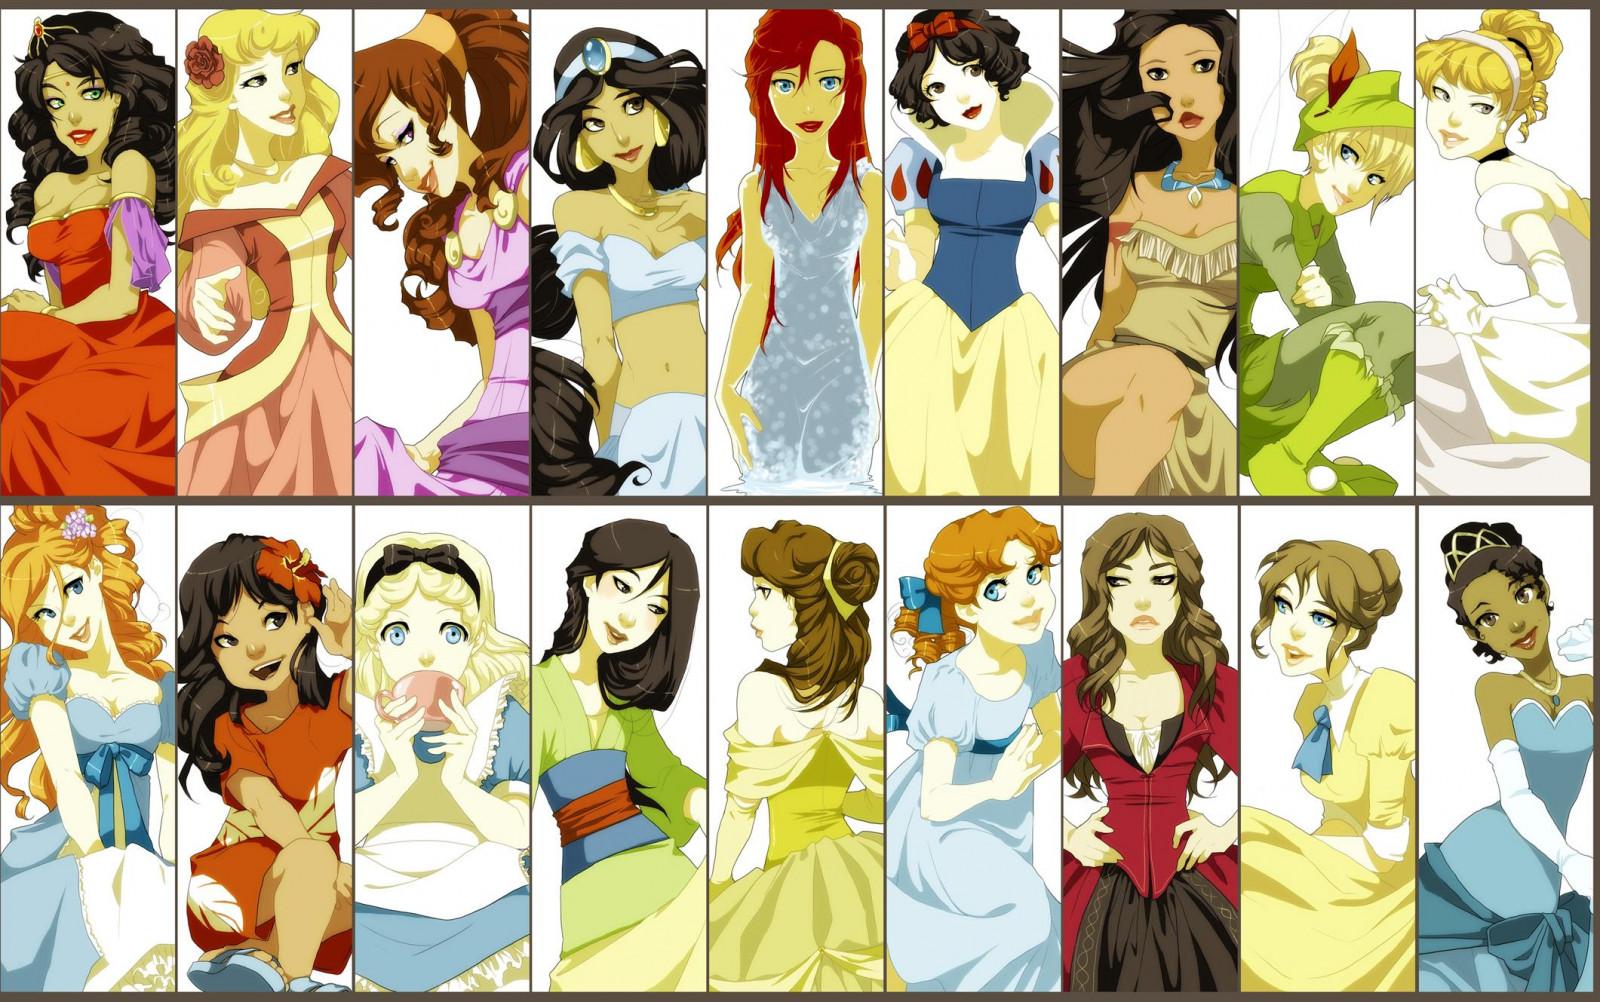 Wallpaper Illustration Fantasy Art Anime Collage Cartoon